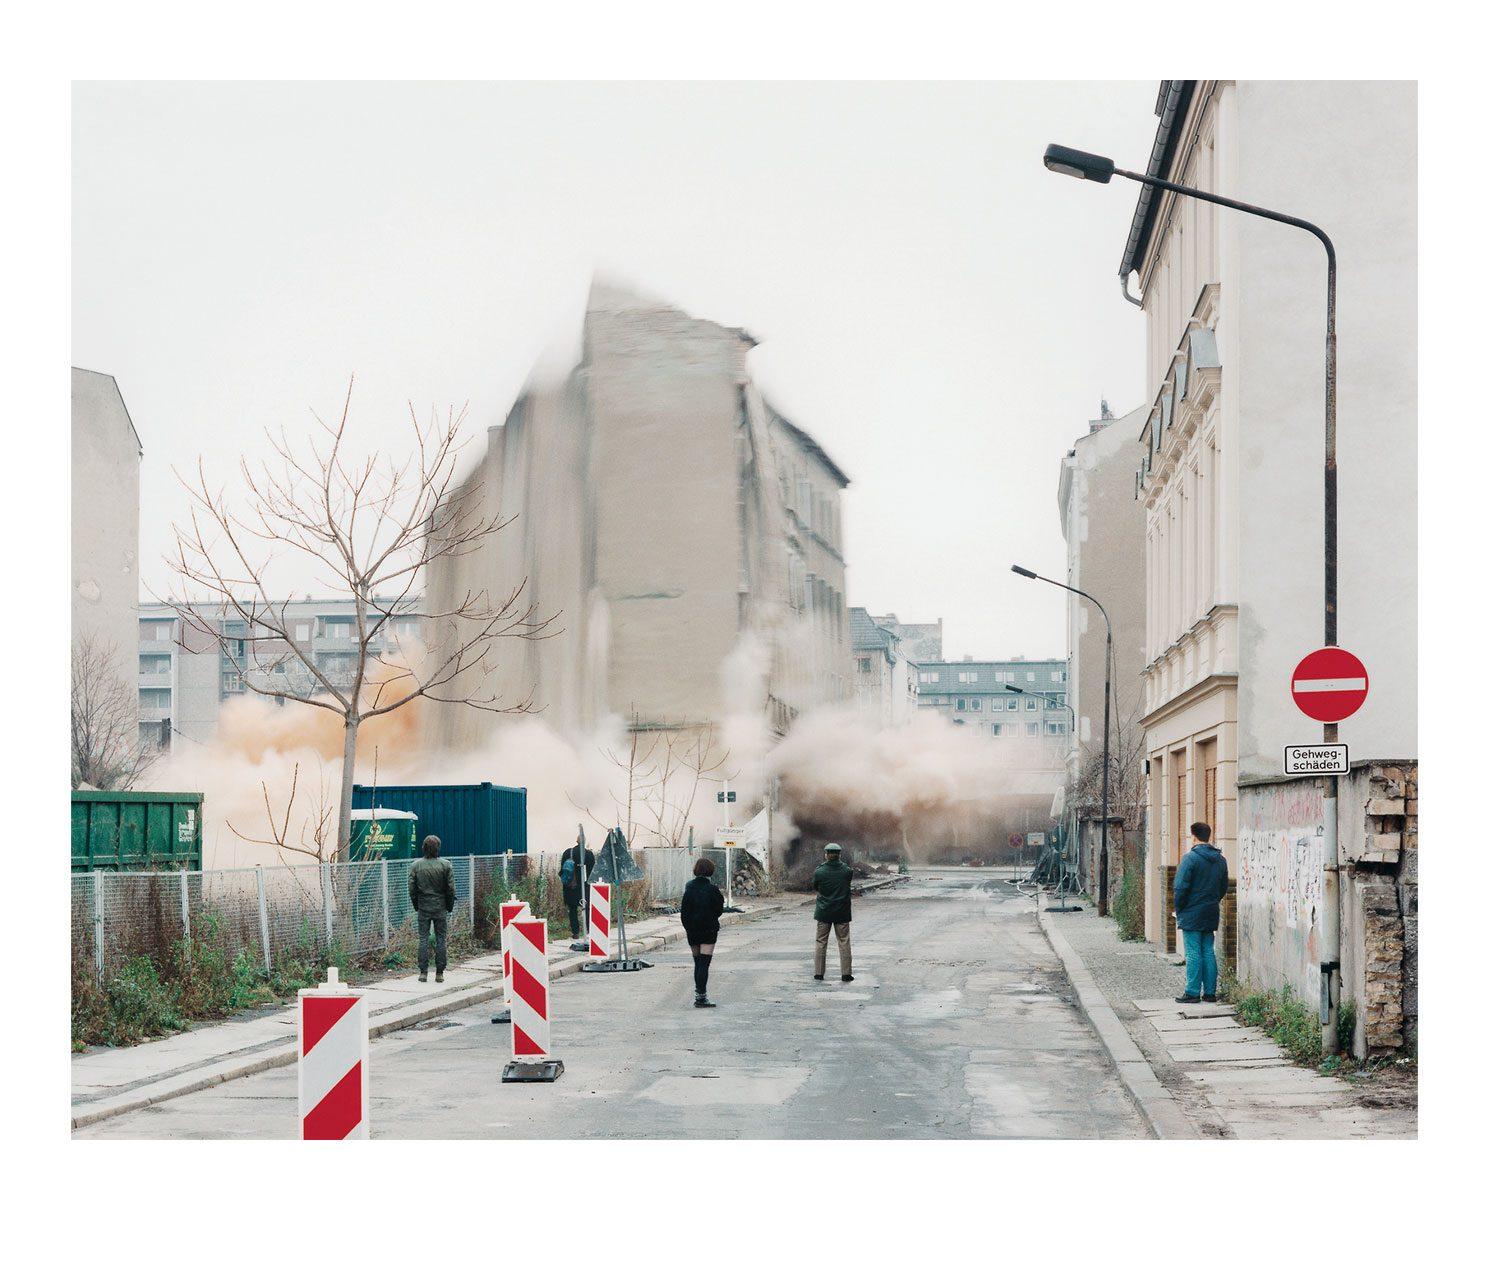 Stadt #10, Sprengung Mulackstrasse, 1995